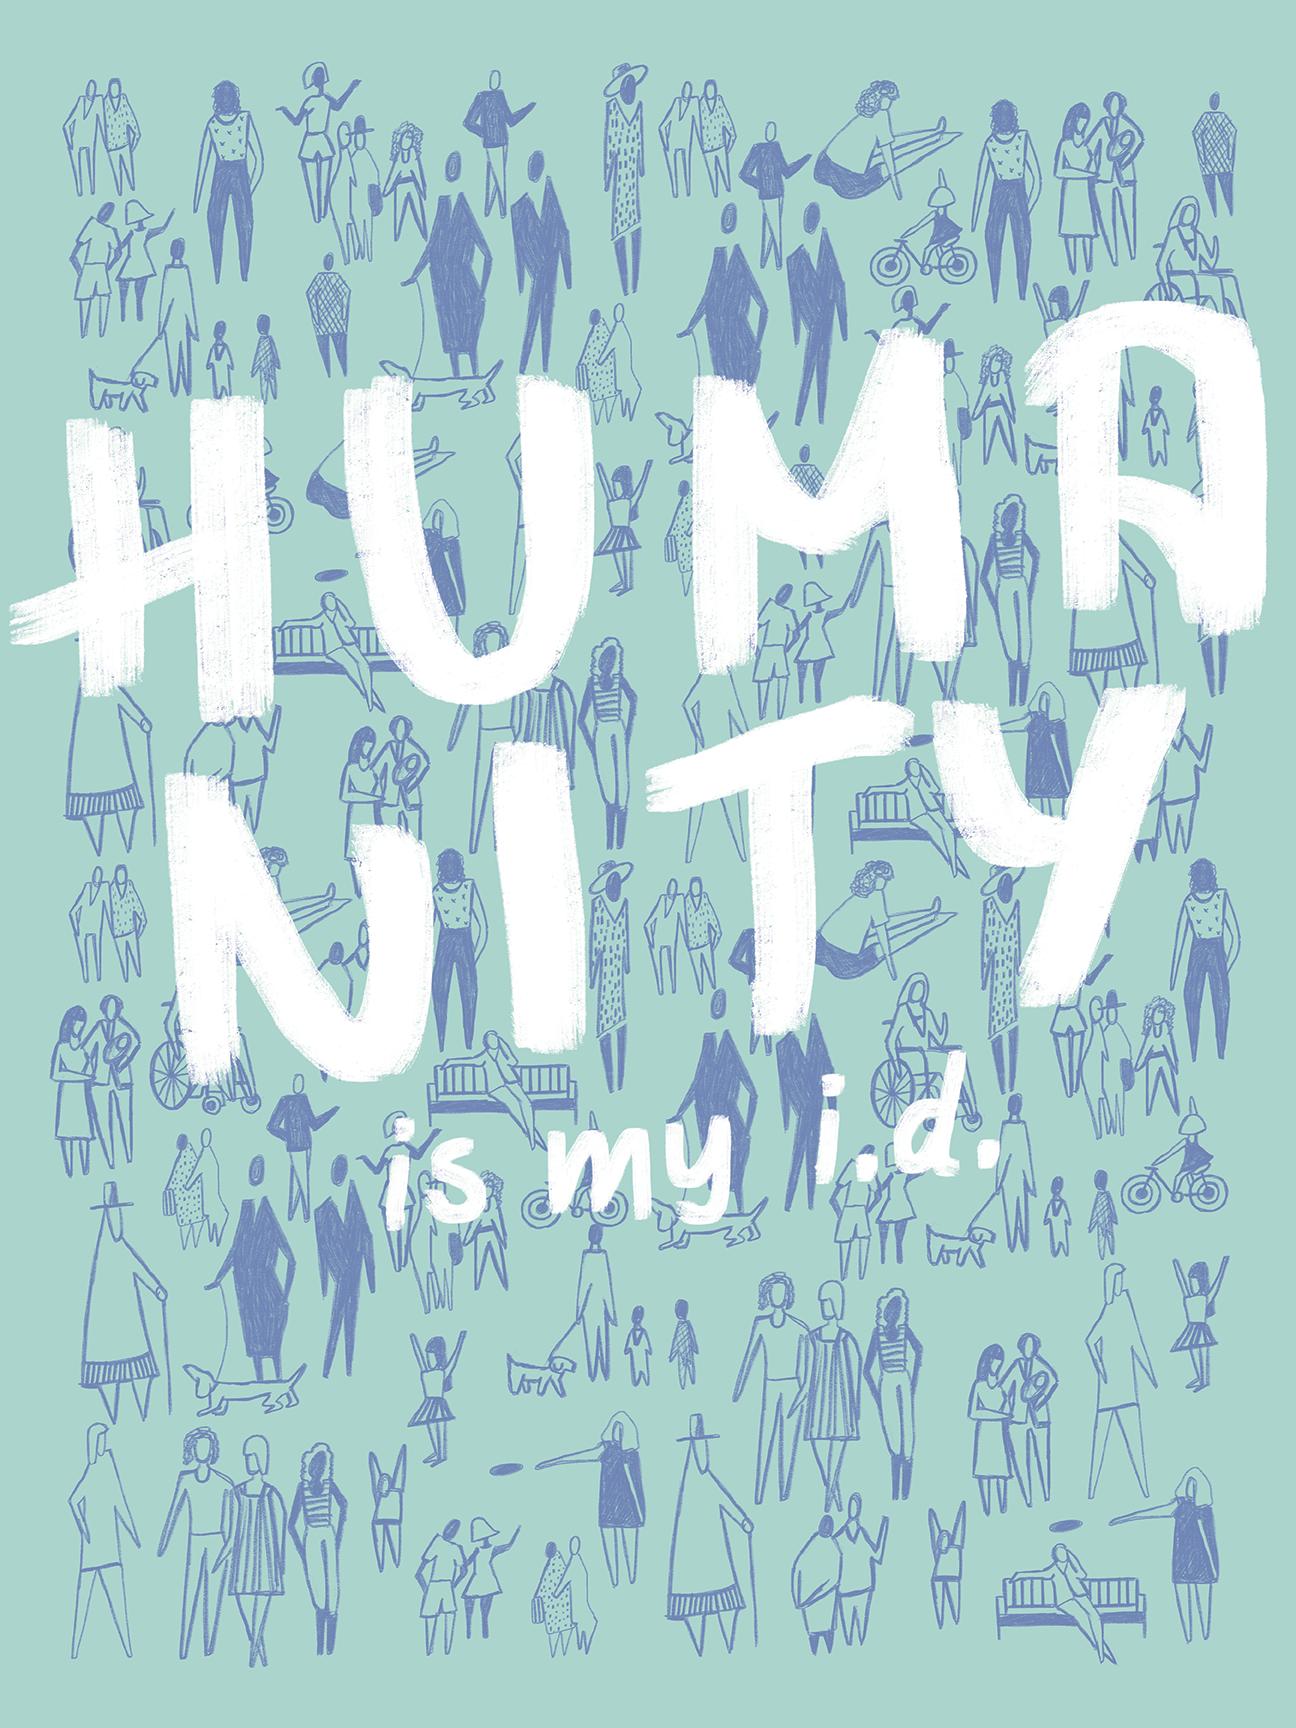 HUMANITY by Kelsey Scofield